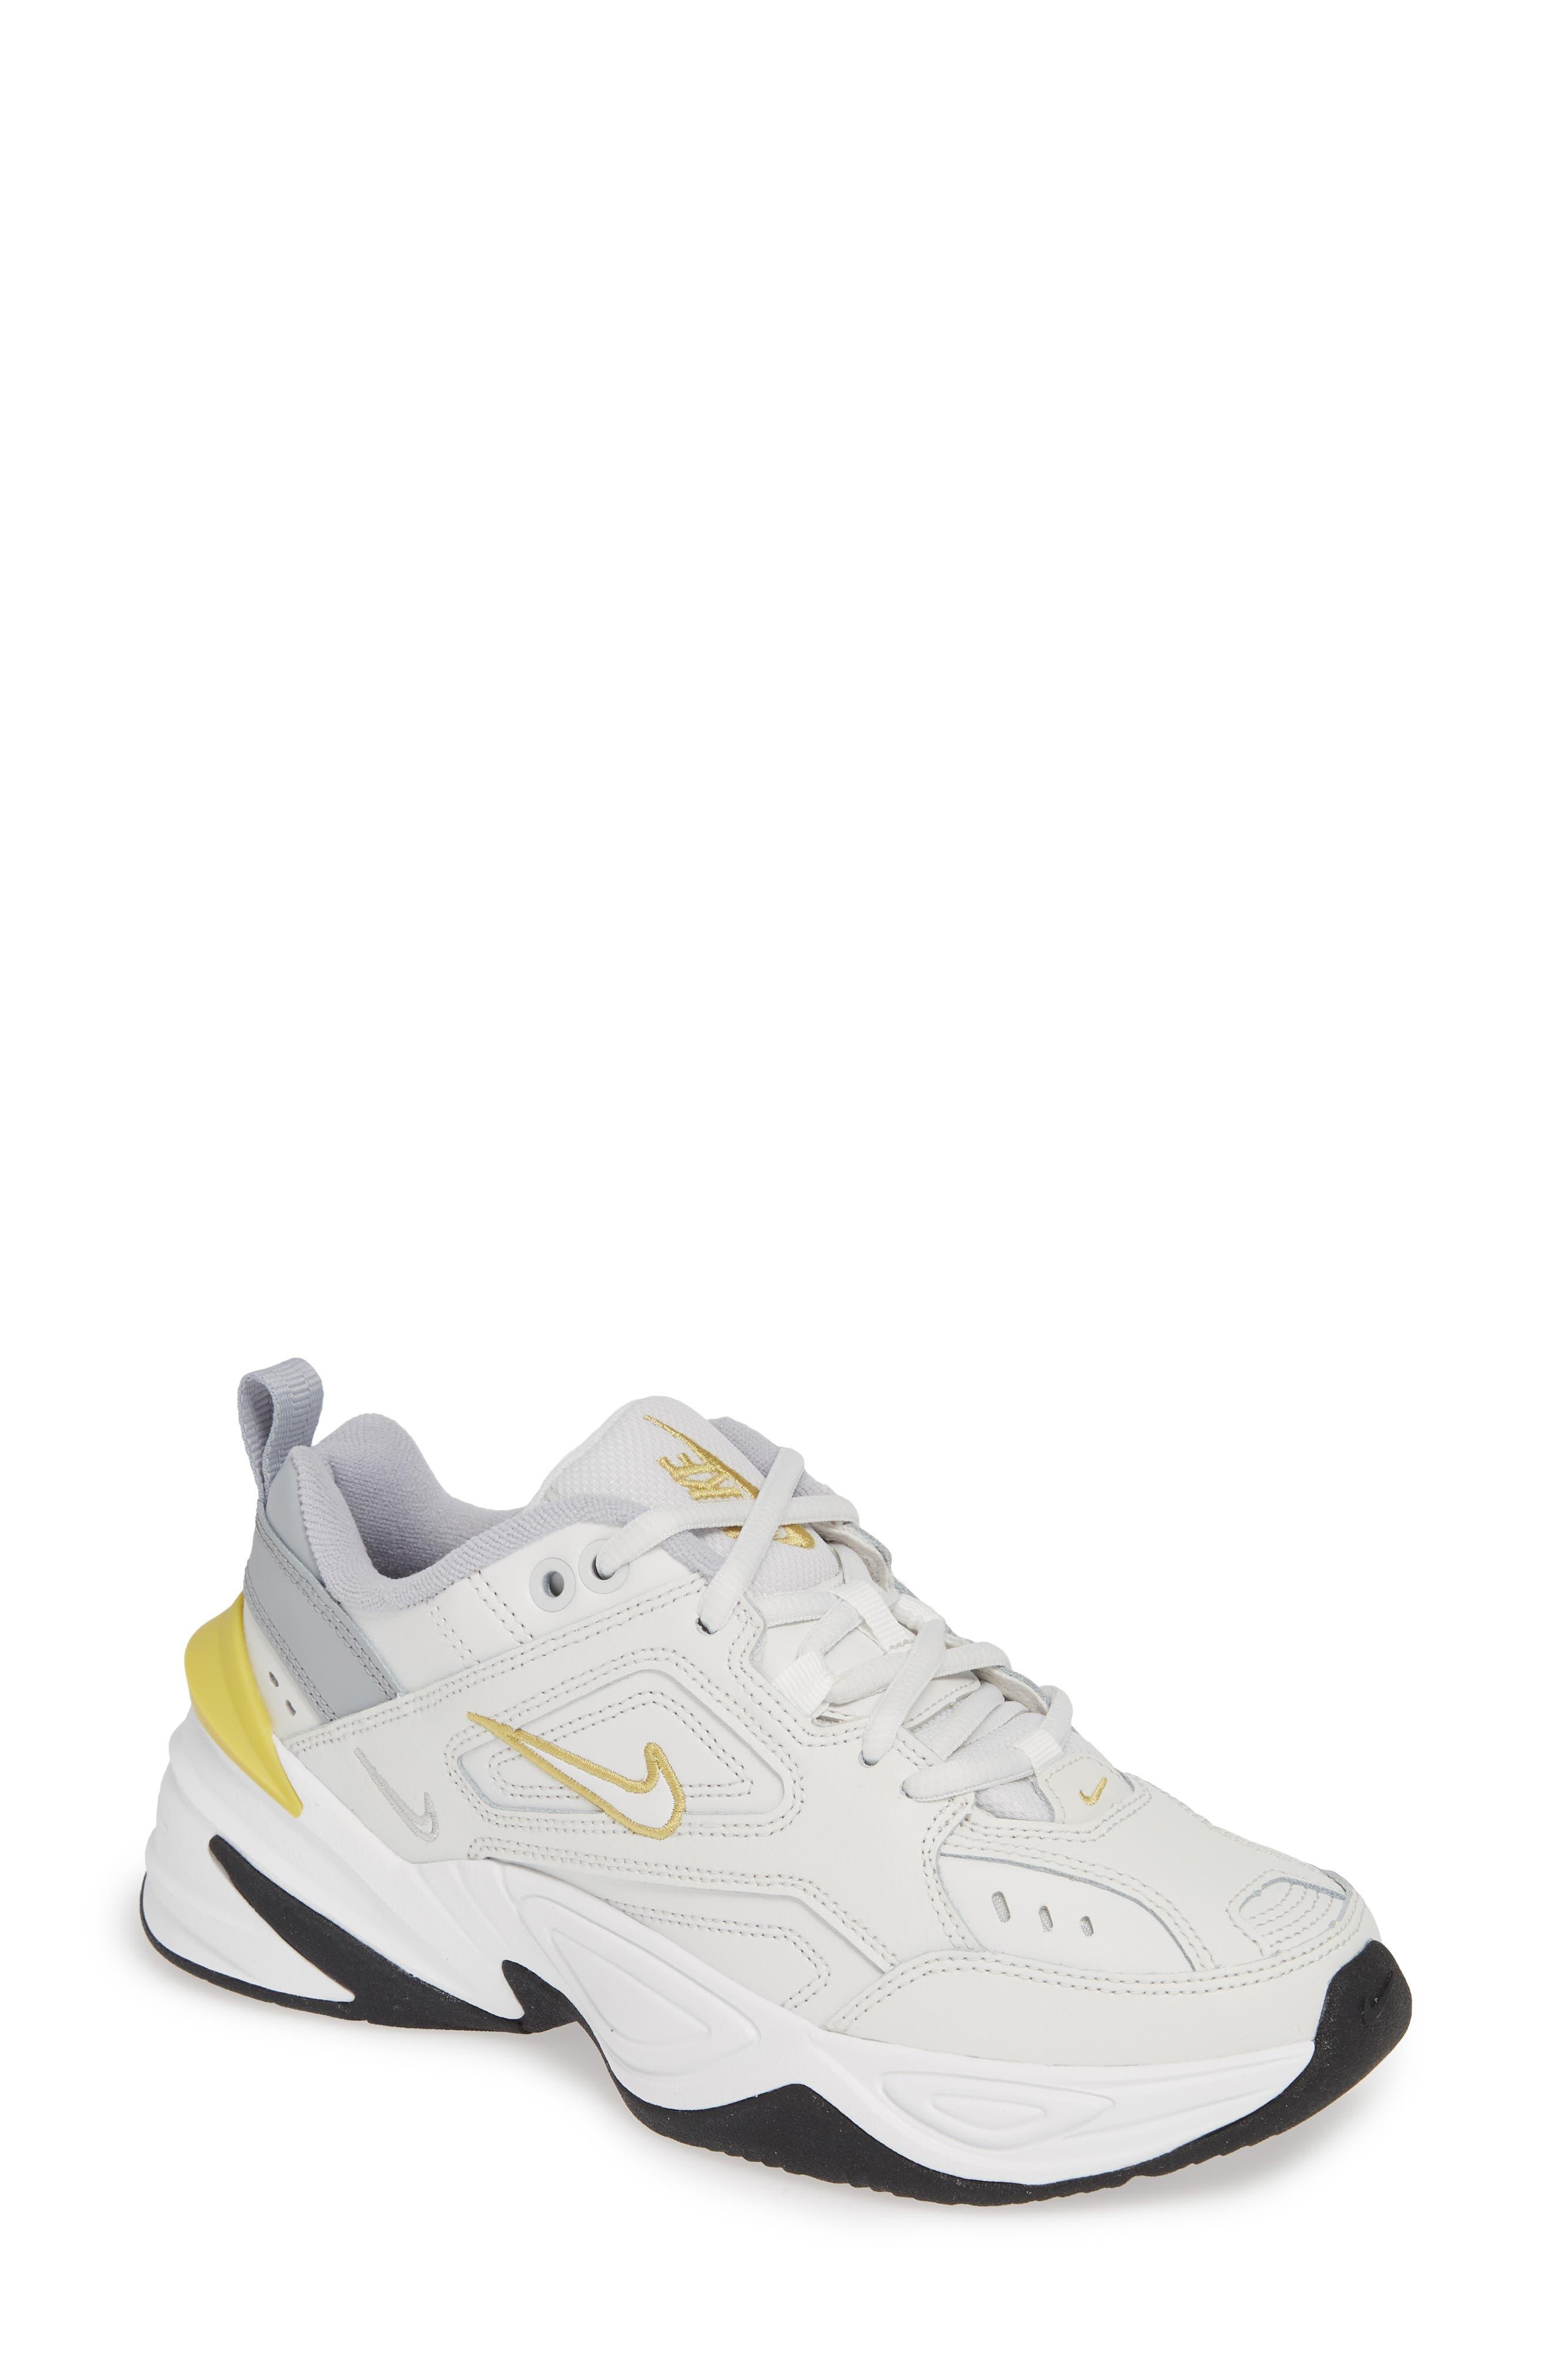 M2K Tekno Sneaker,                         Main,                         color, PLATINUM TINT/ CELERY/ GREY